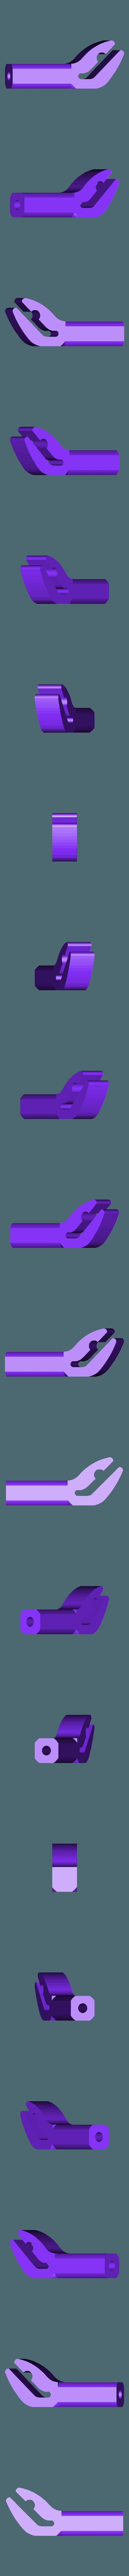 SpatbordClipV2.stl Download free STL file Bicycle Mudguard Clip • 3D print model, Milan_Gajic